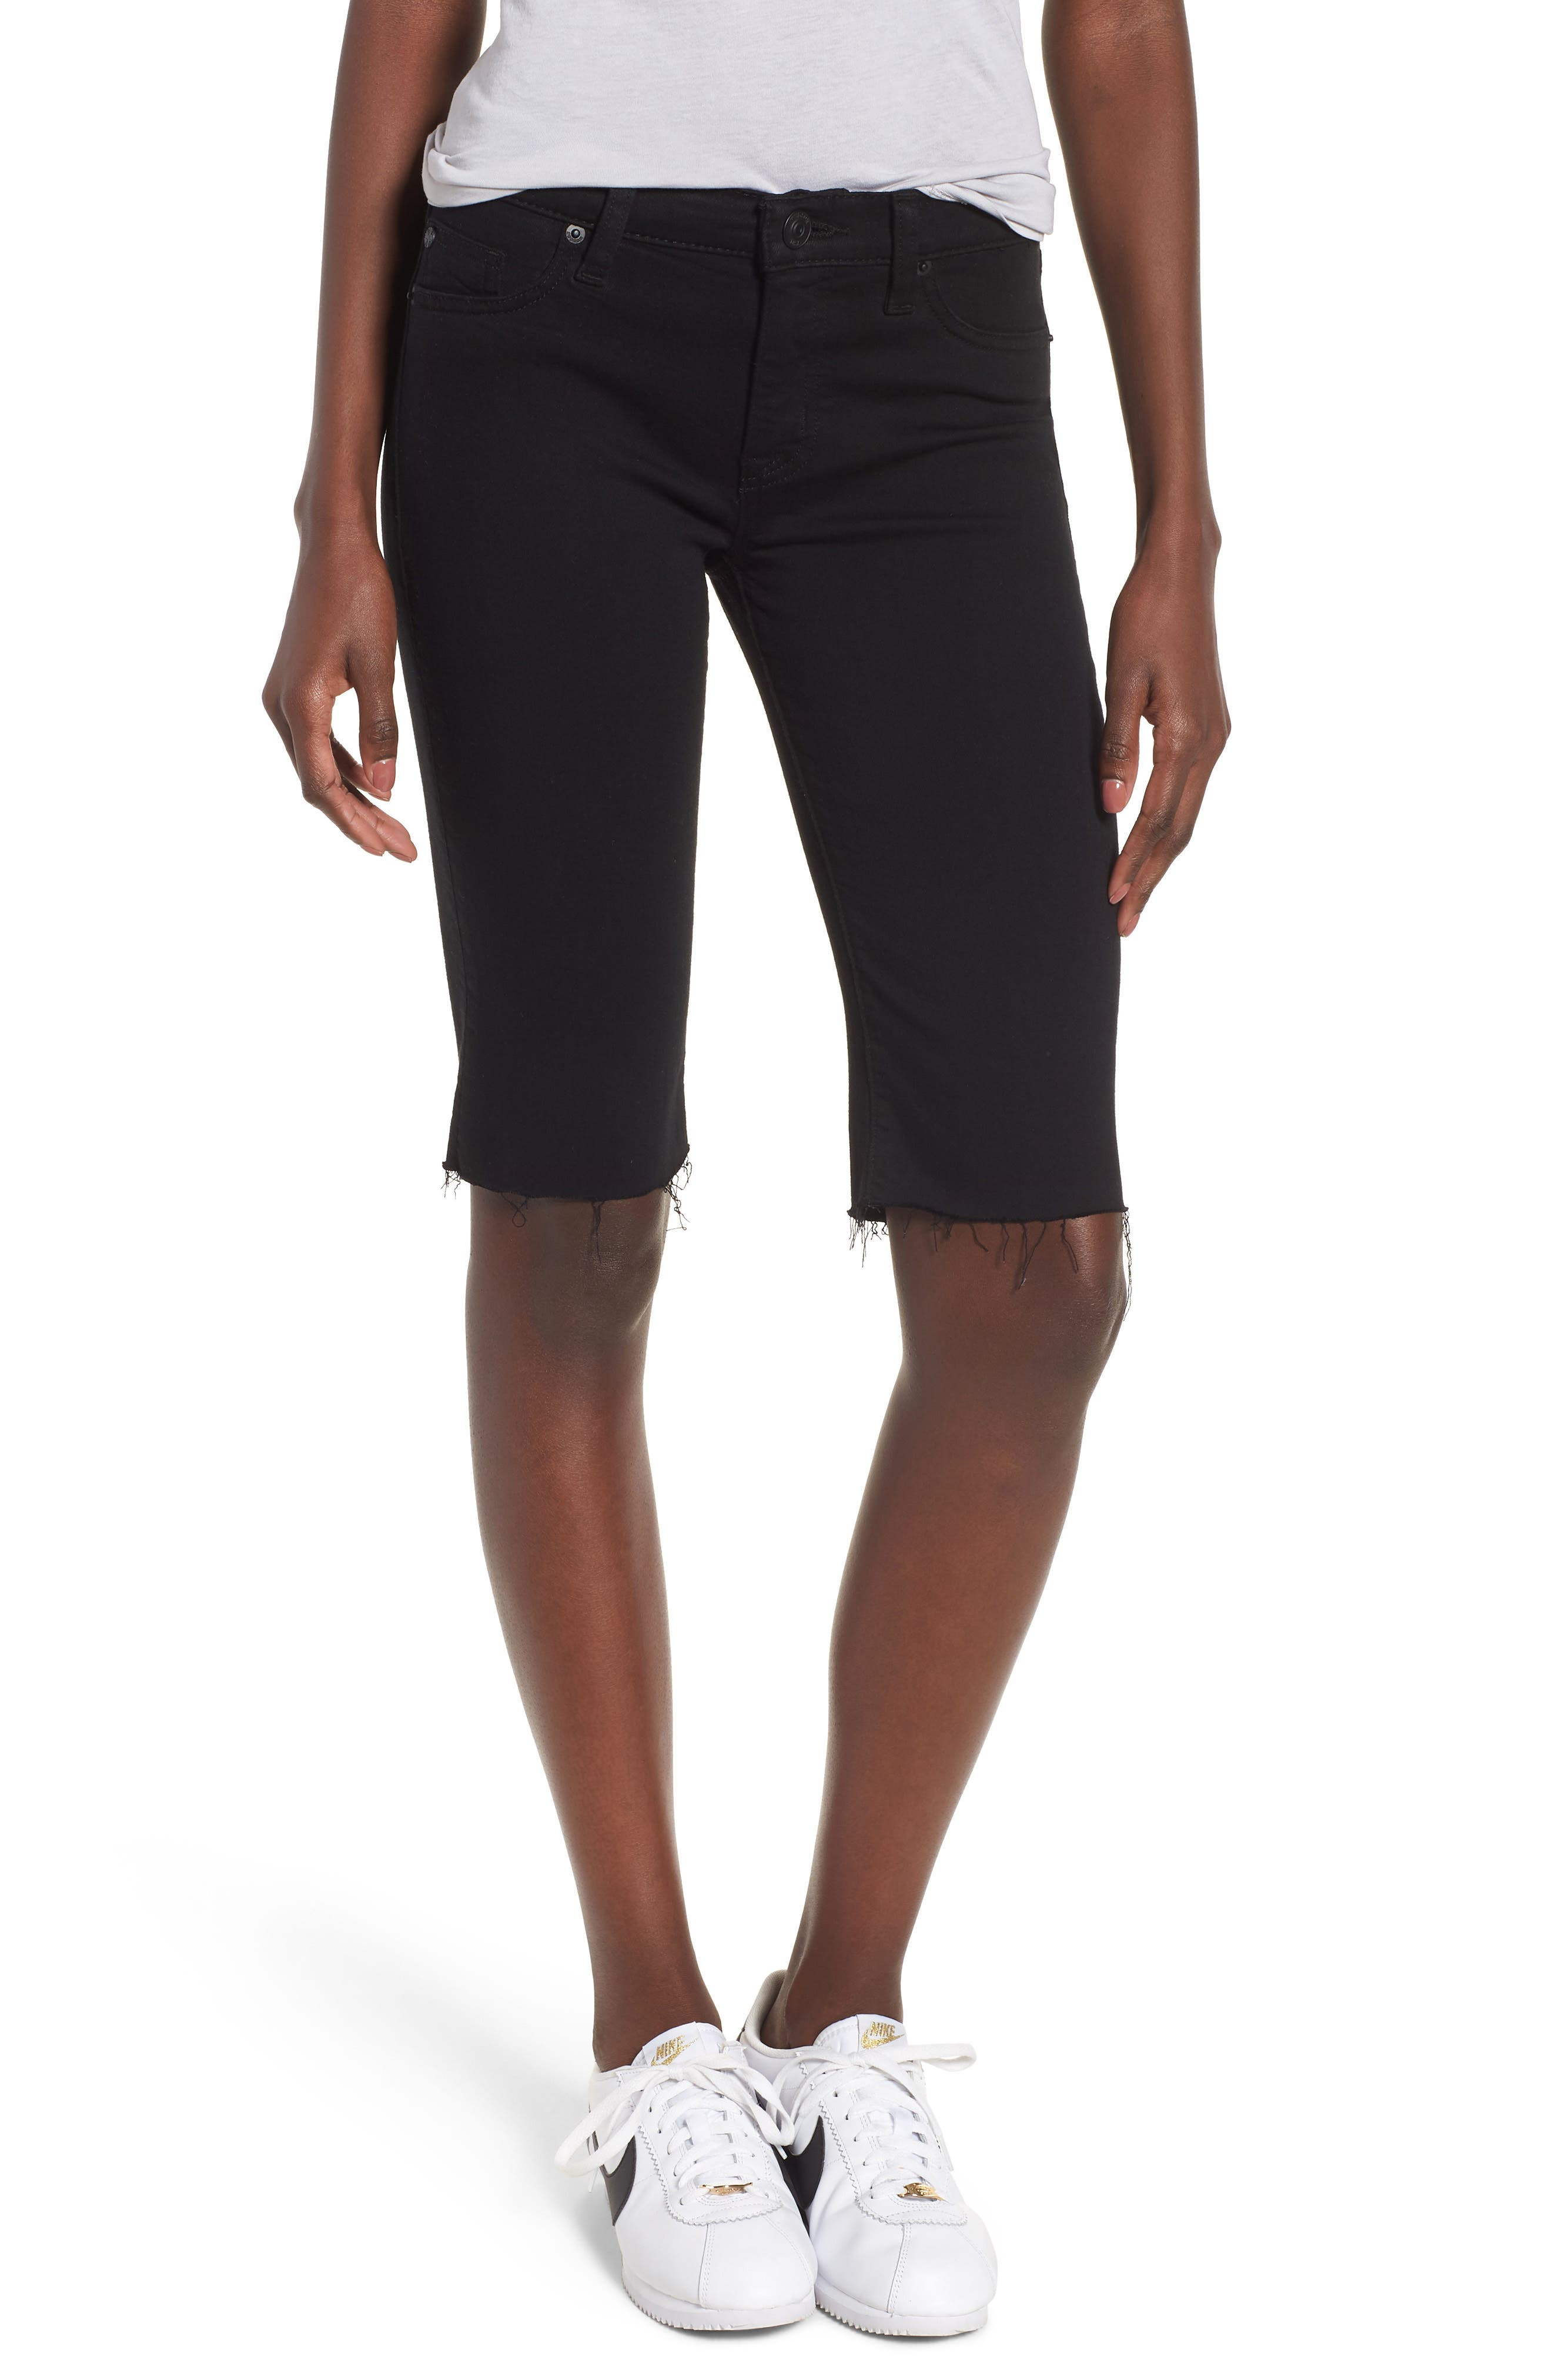 Amelia Cutoff Knee Shorts,                             Main thumbnail 1, color,                             Black